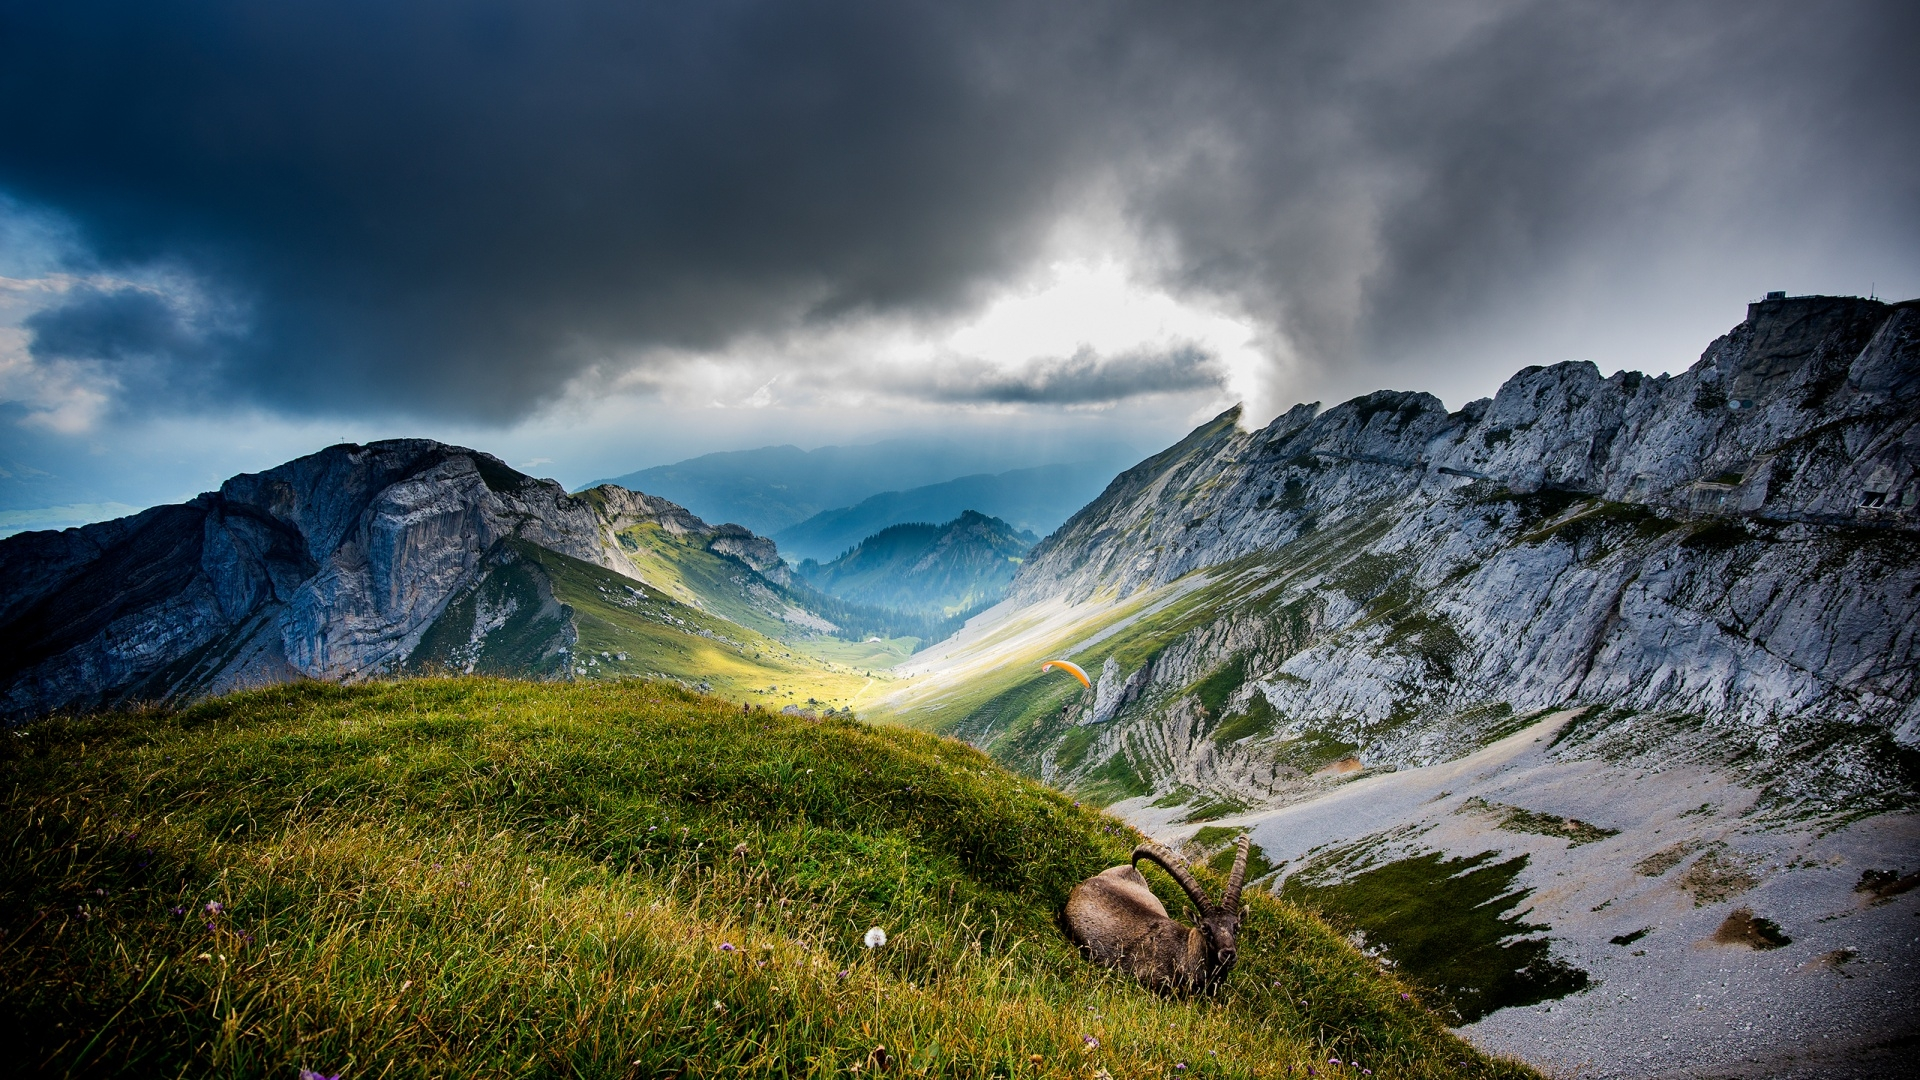 Free Falling Snow Wallpaper Mountain Background 1080p Hd Hd Desktop Wallpapers 4k Hd